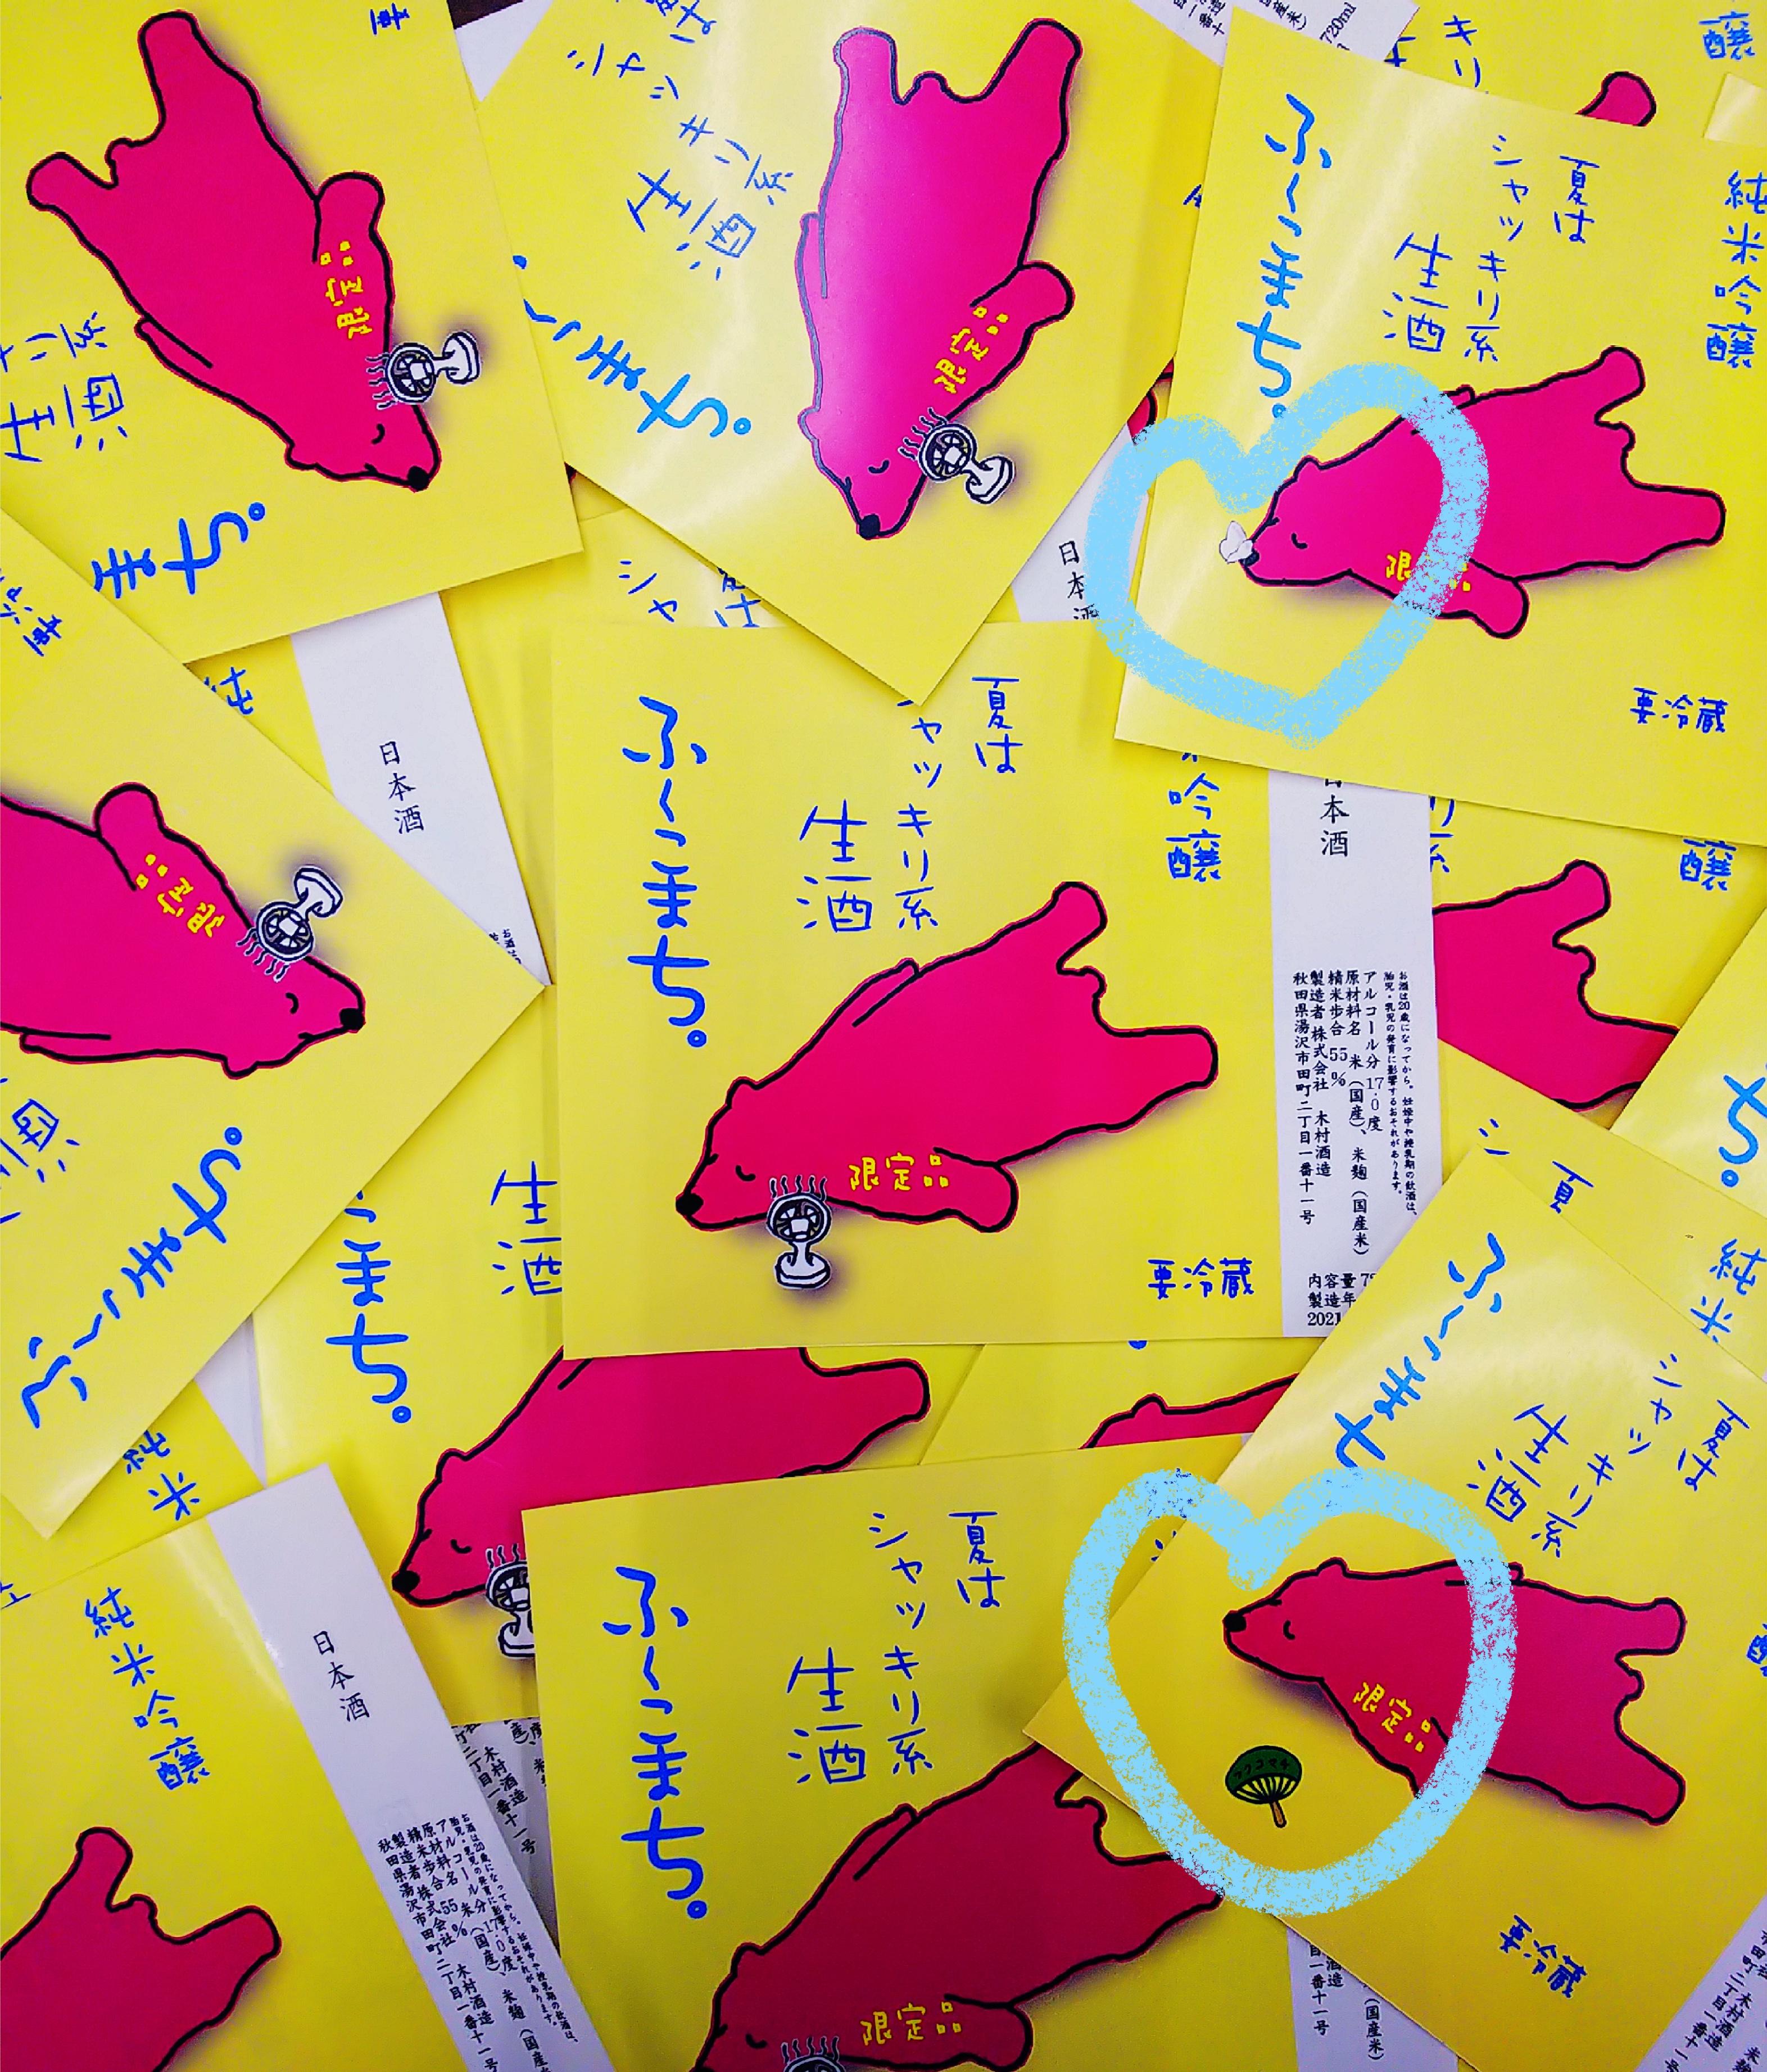 http://www.fukukomachi.com/blog/photo/C360_20210720-165352-66.jpg